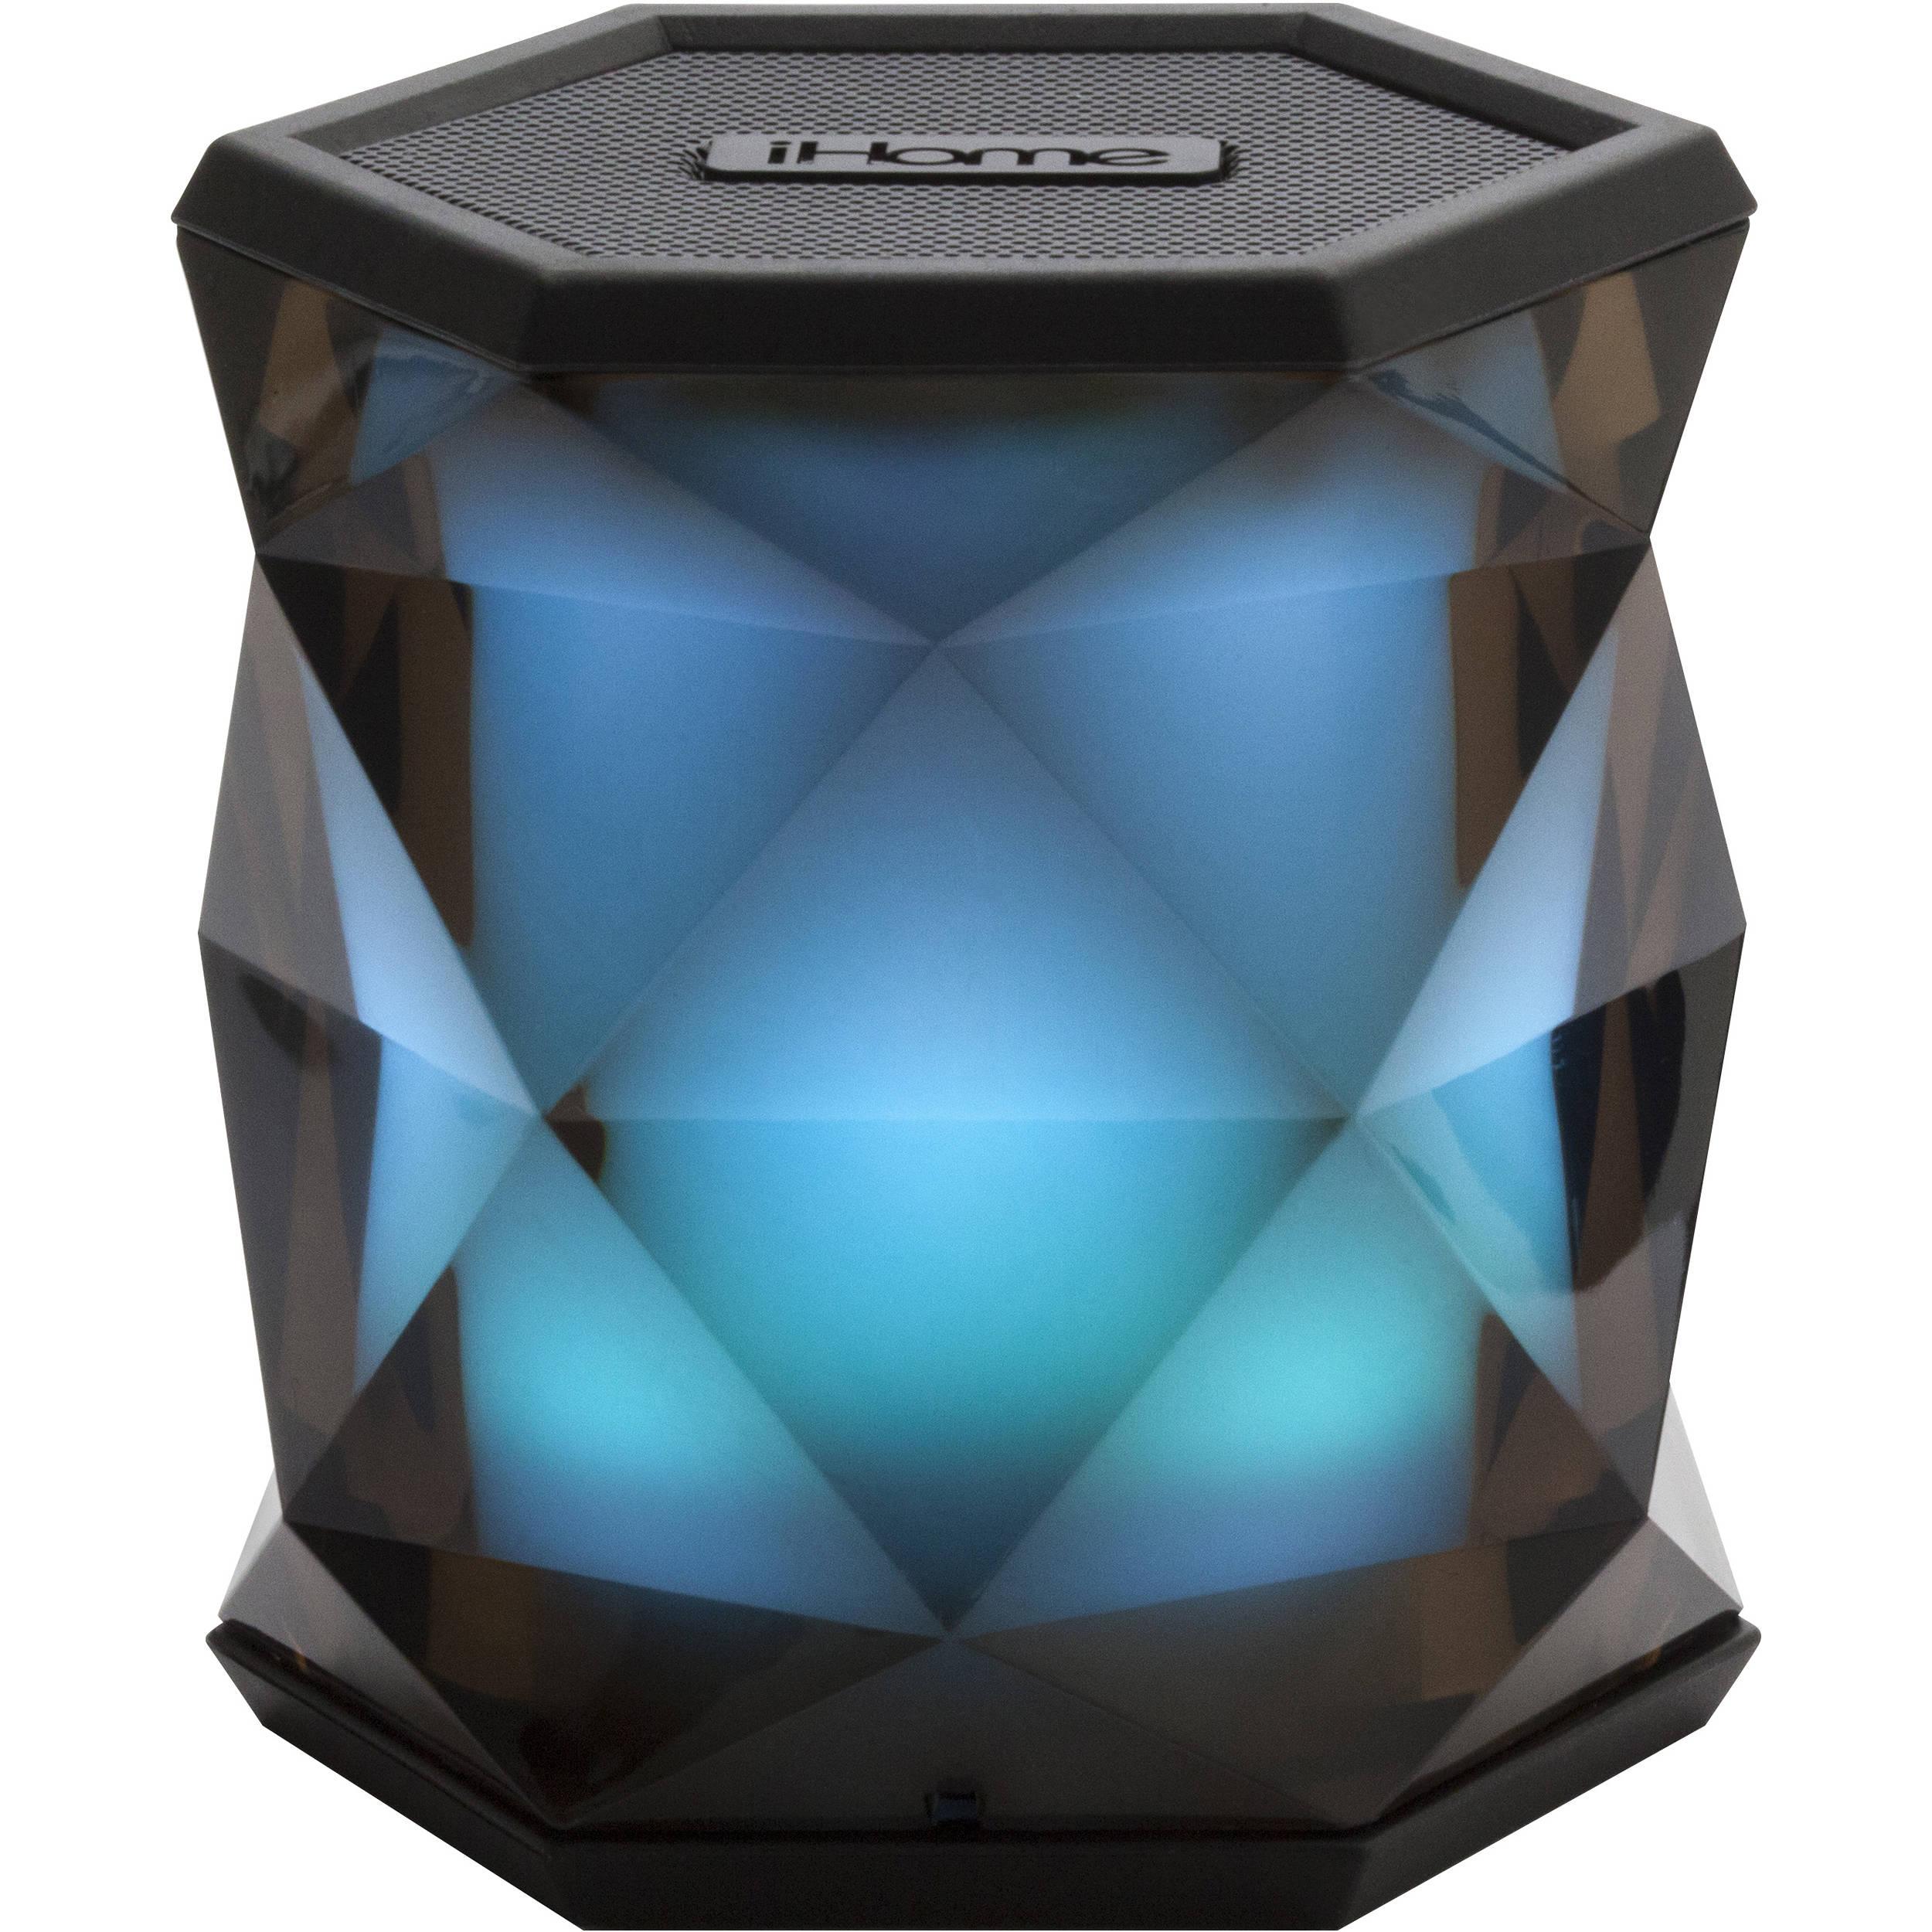 IHome IBT68 Mini Bluetooth Speaker IBT68BC B&H Photo Video